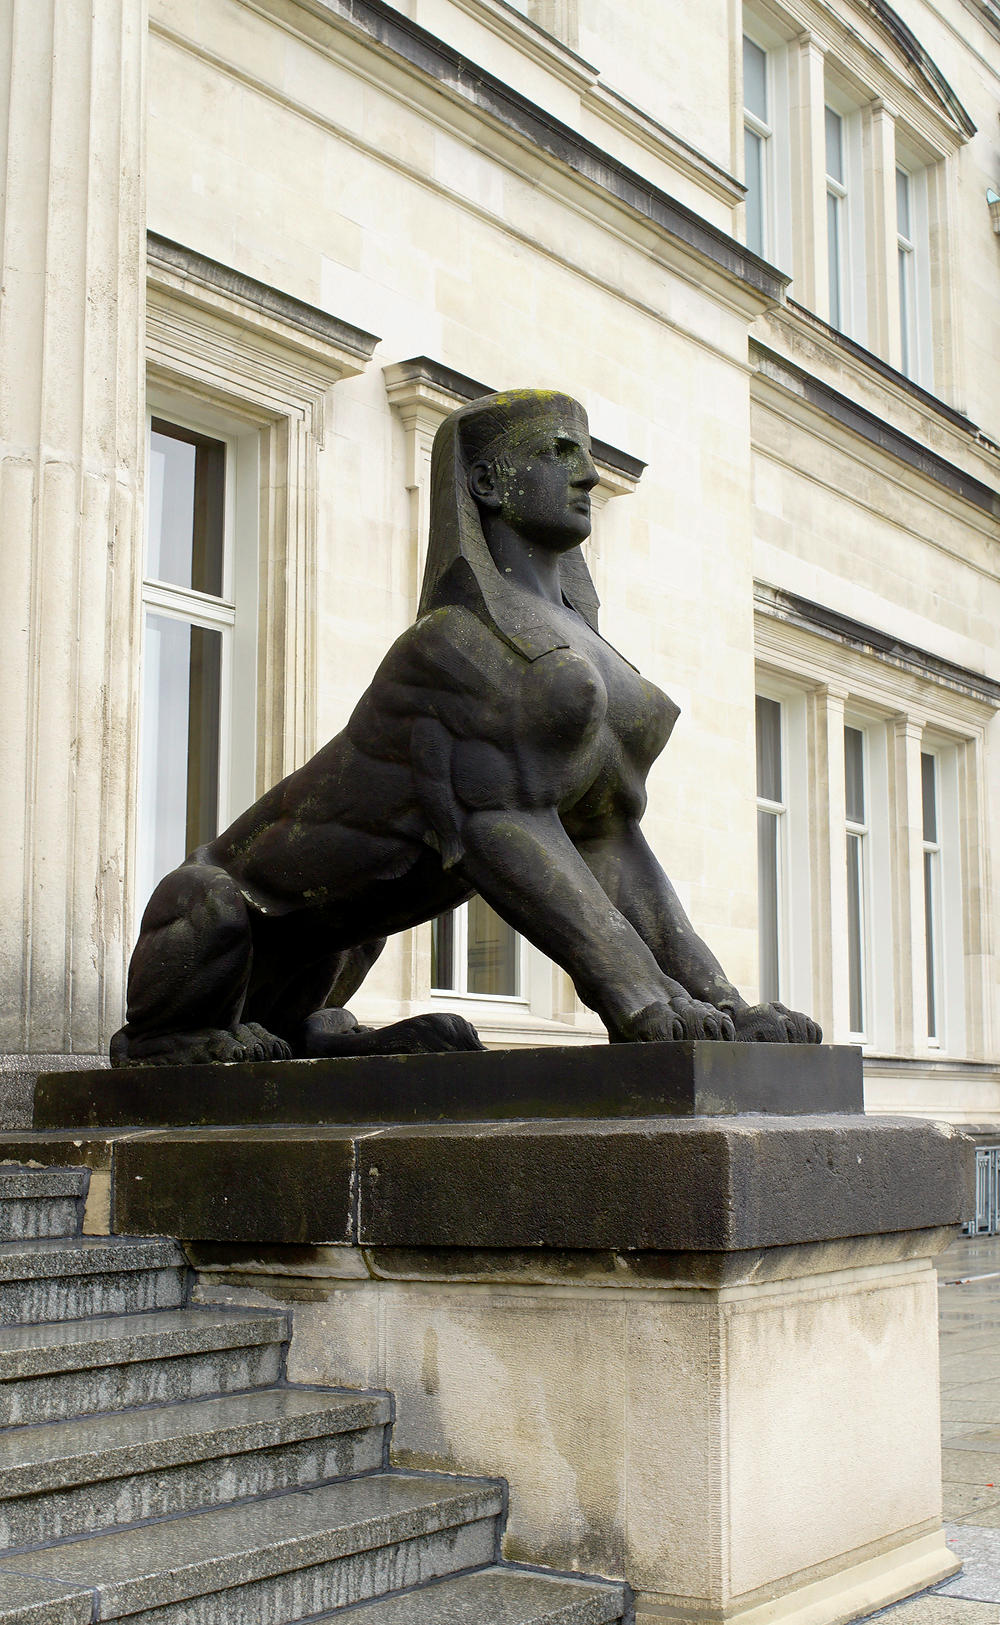 mit stolz gereckter Brust ~ Sphinx am Gartenportal